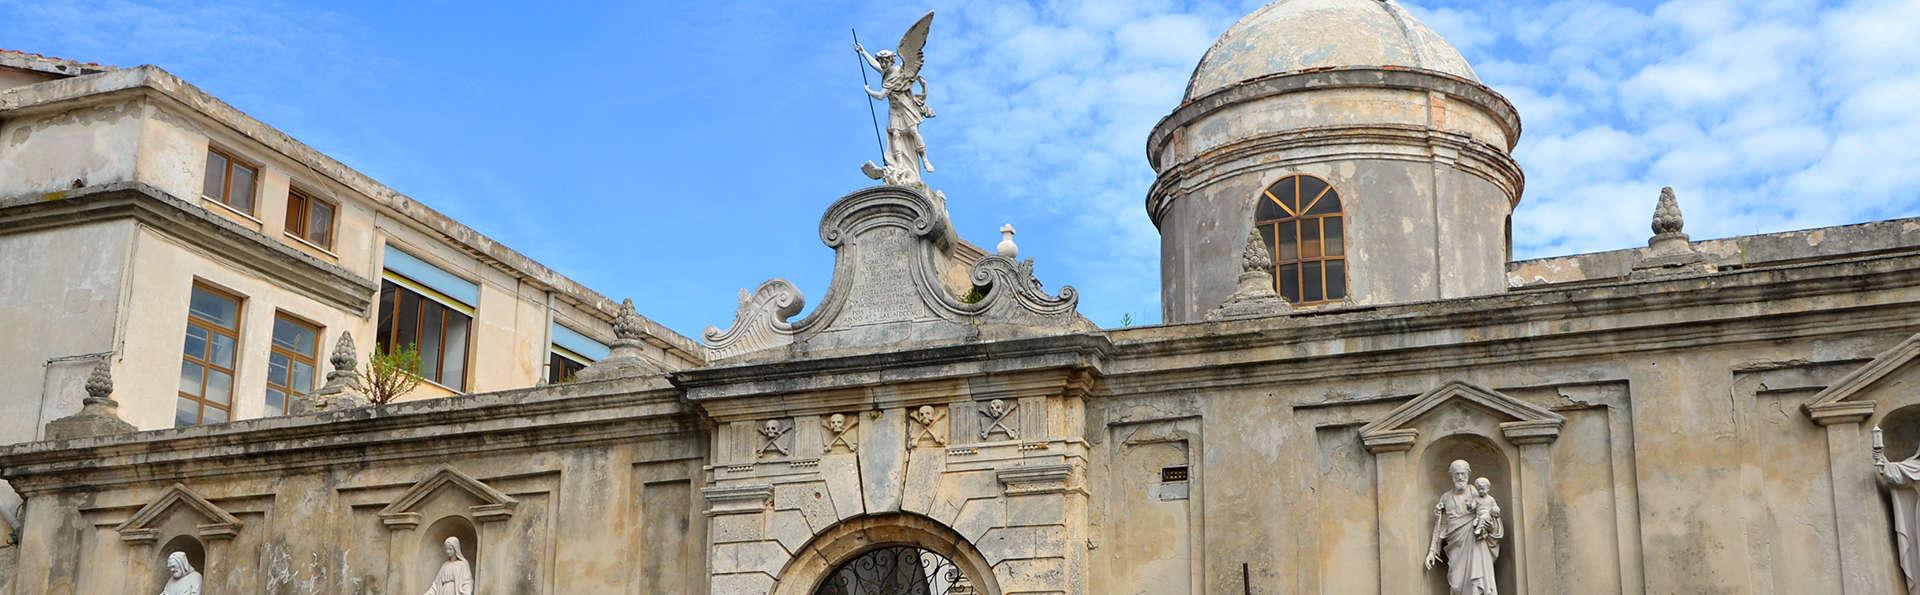 Hotel Pineta - edit_shutterstock_185304716_VICO-DEL-GARGANO.jpg